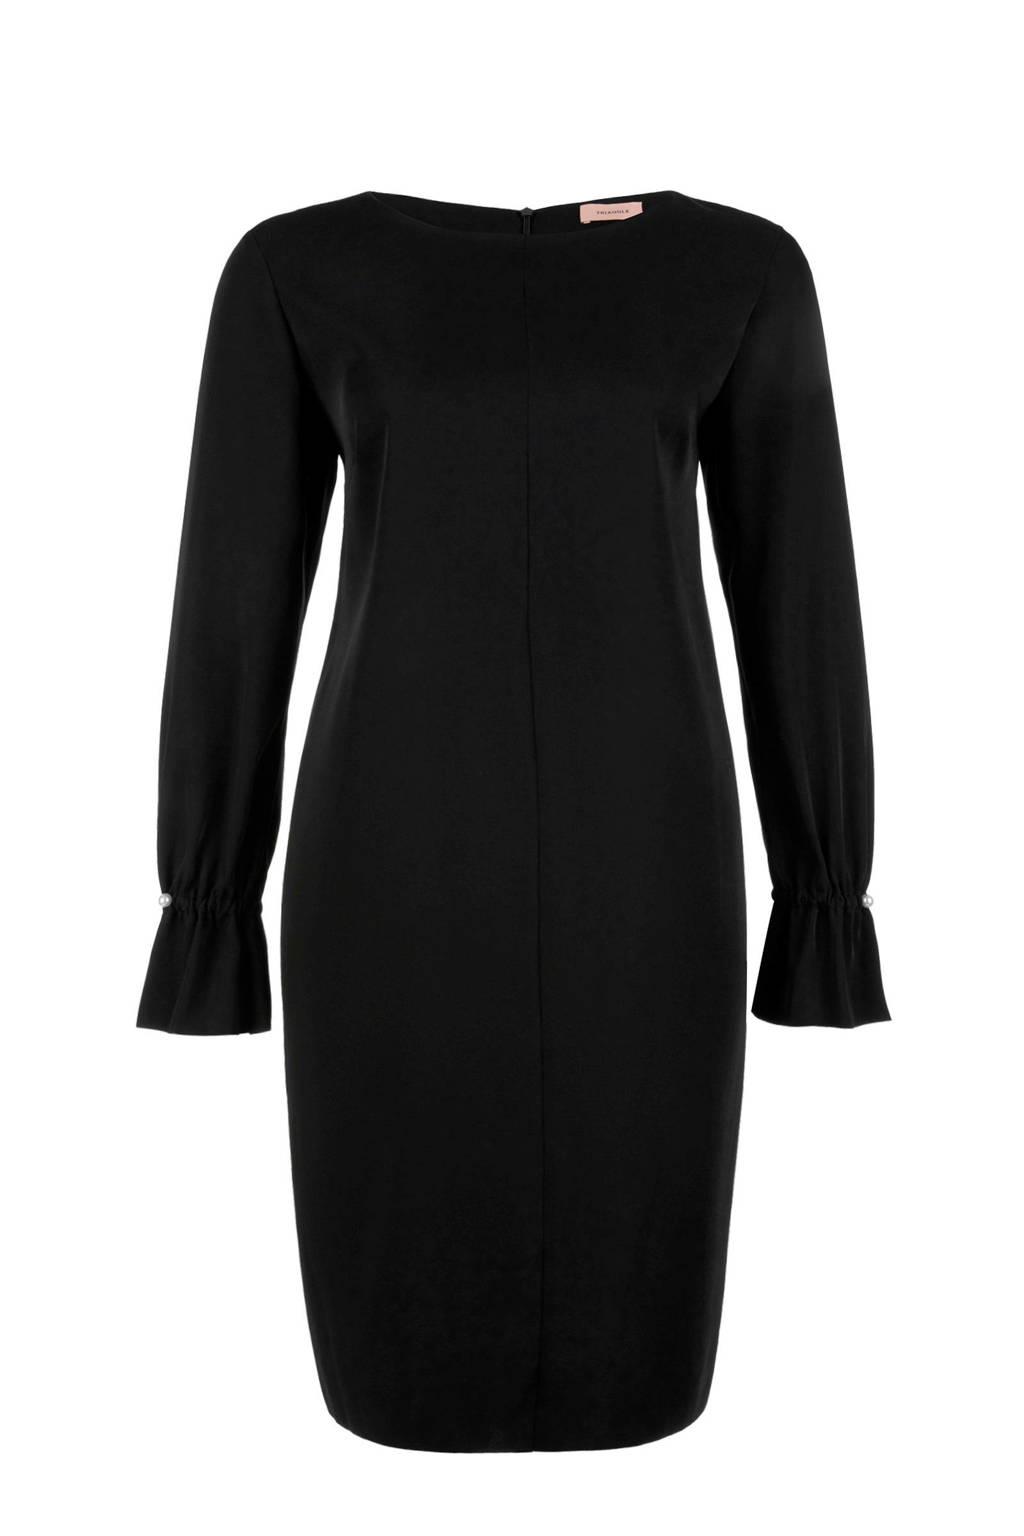 TRIANGLE jurk met volants zwart, Zwart